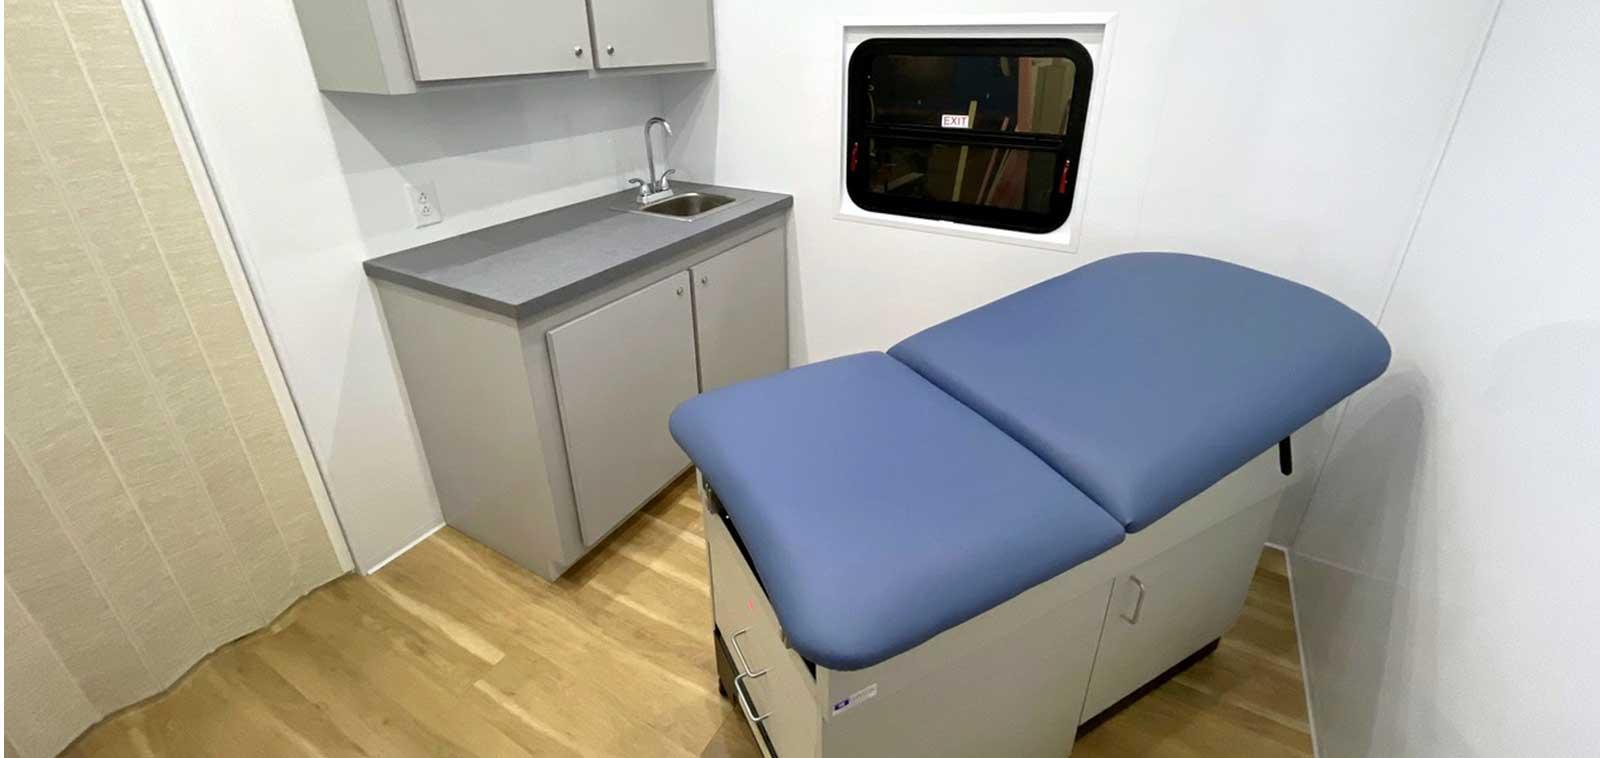 Plan_A_Medical_Box_Truck_3